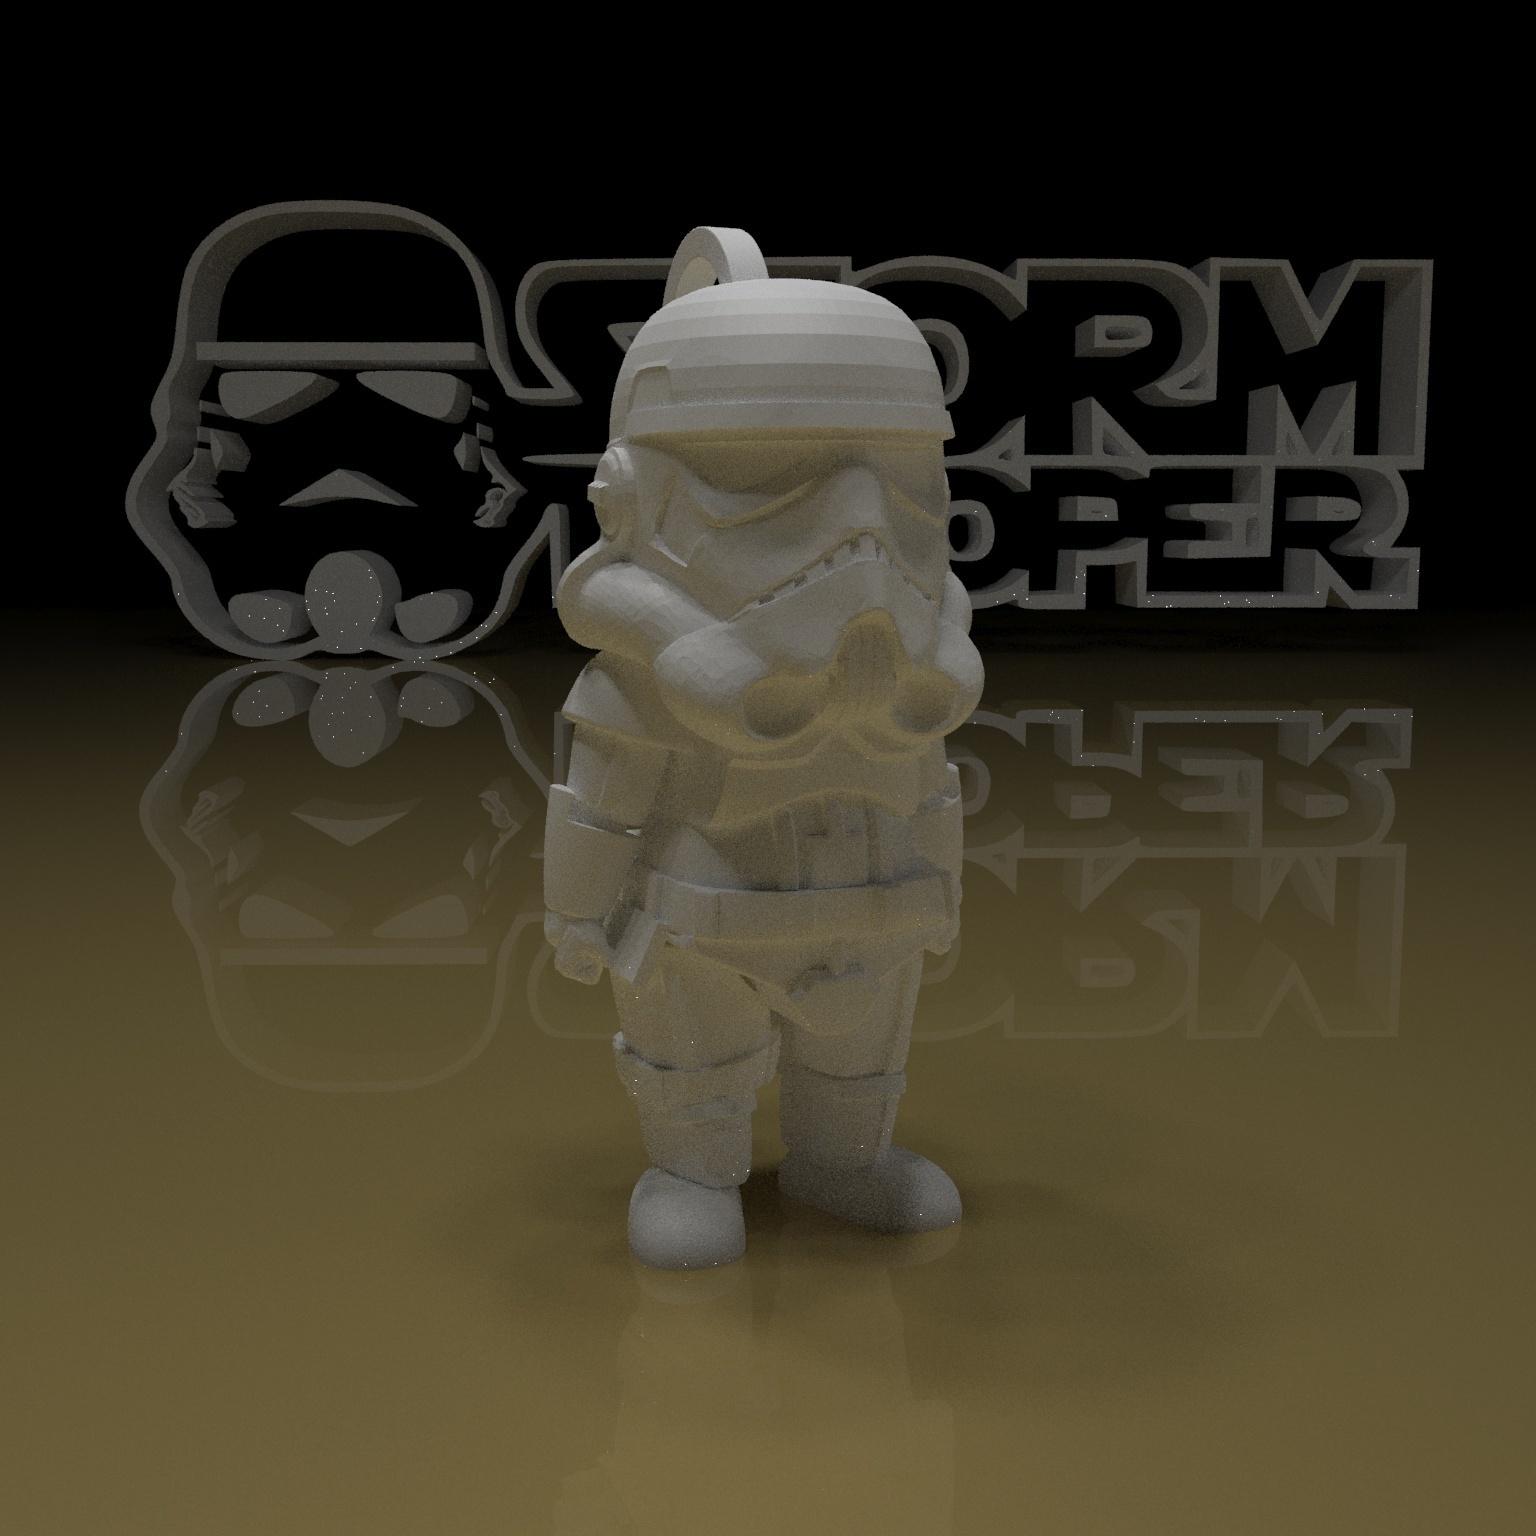 10.jpg Download free STL file STORMTROOPER KEY CHAIN • 3D printing template, paltony22